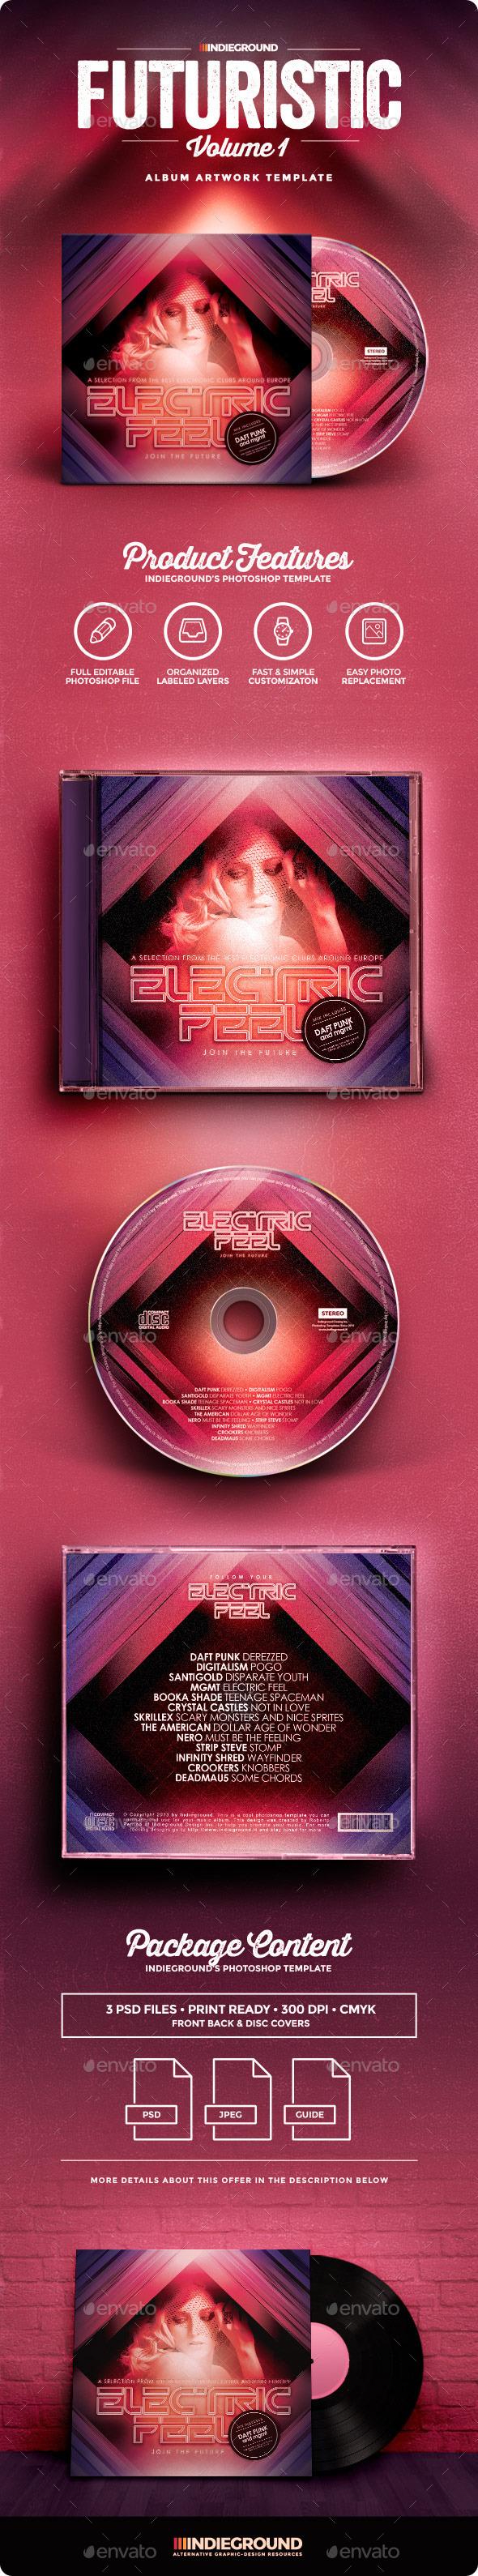 Futuristic CD Album Artwork - CD & DVD Artwork Print Templates